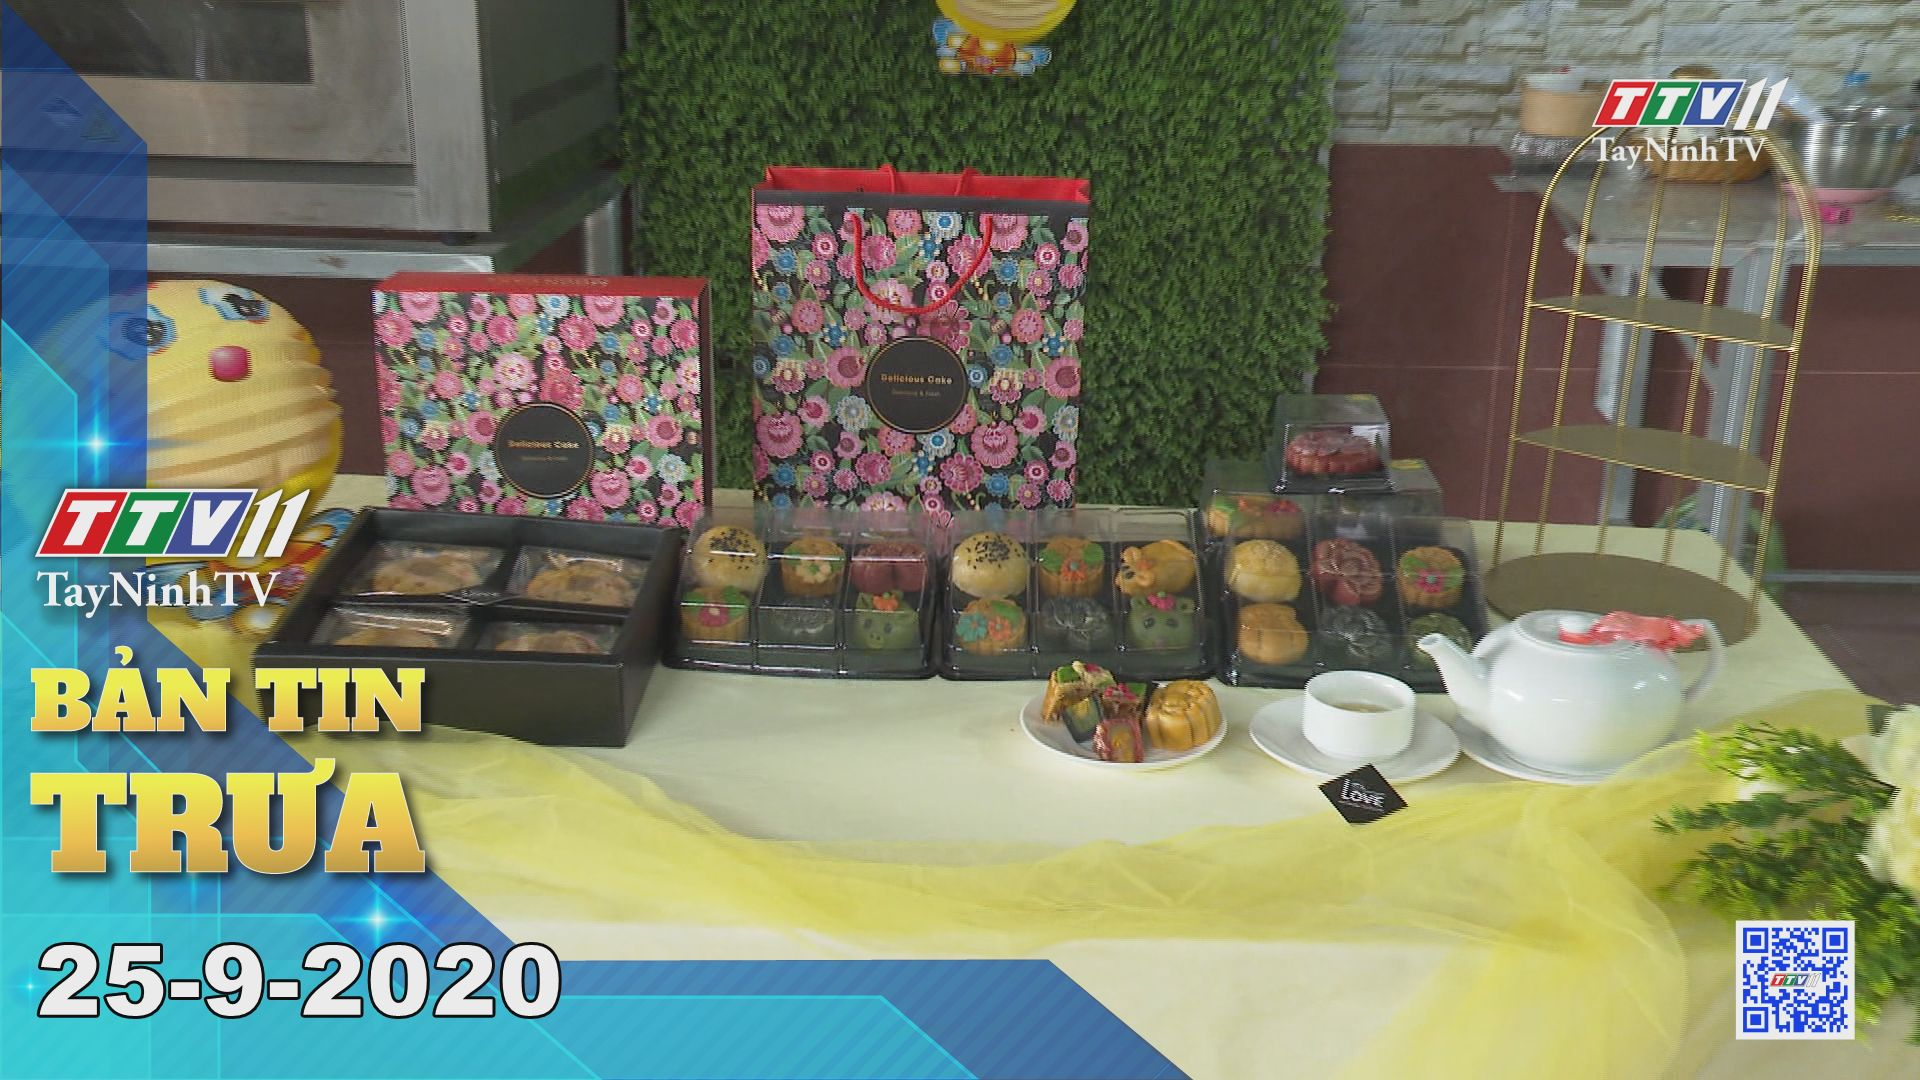 Bản tin trưa 25-9-2020 | Tin tức hôm nay | TayNinhTV